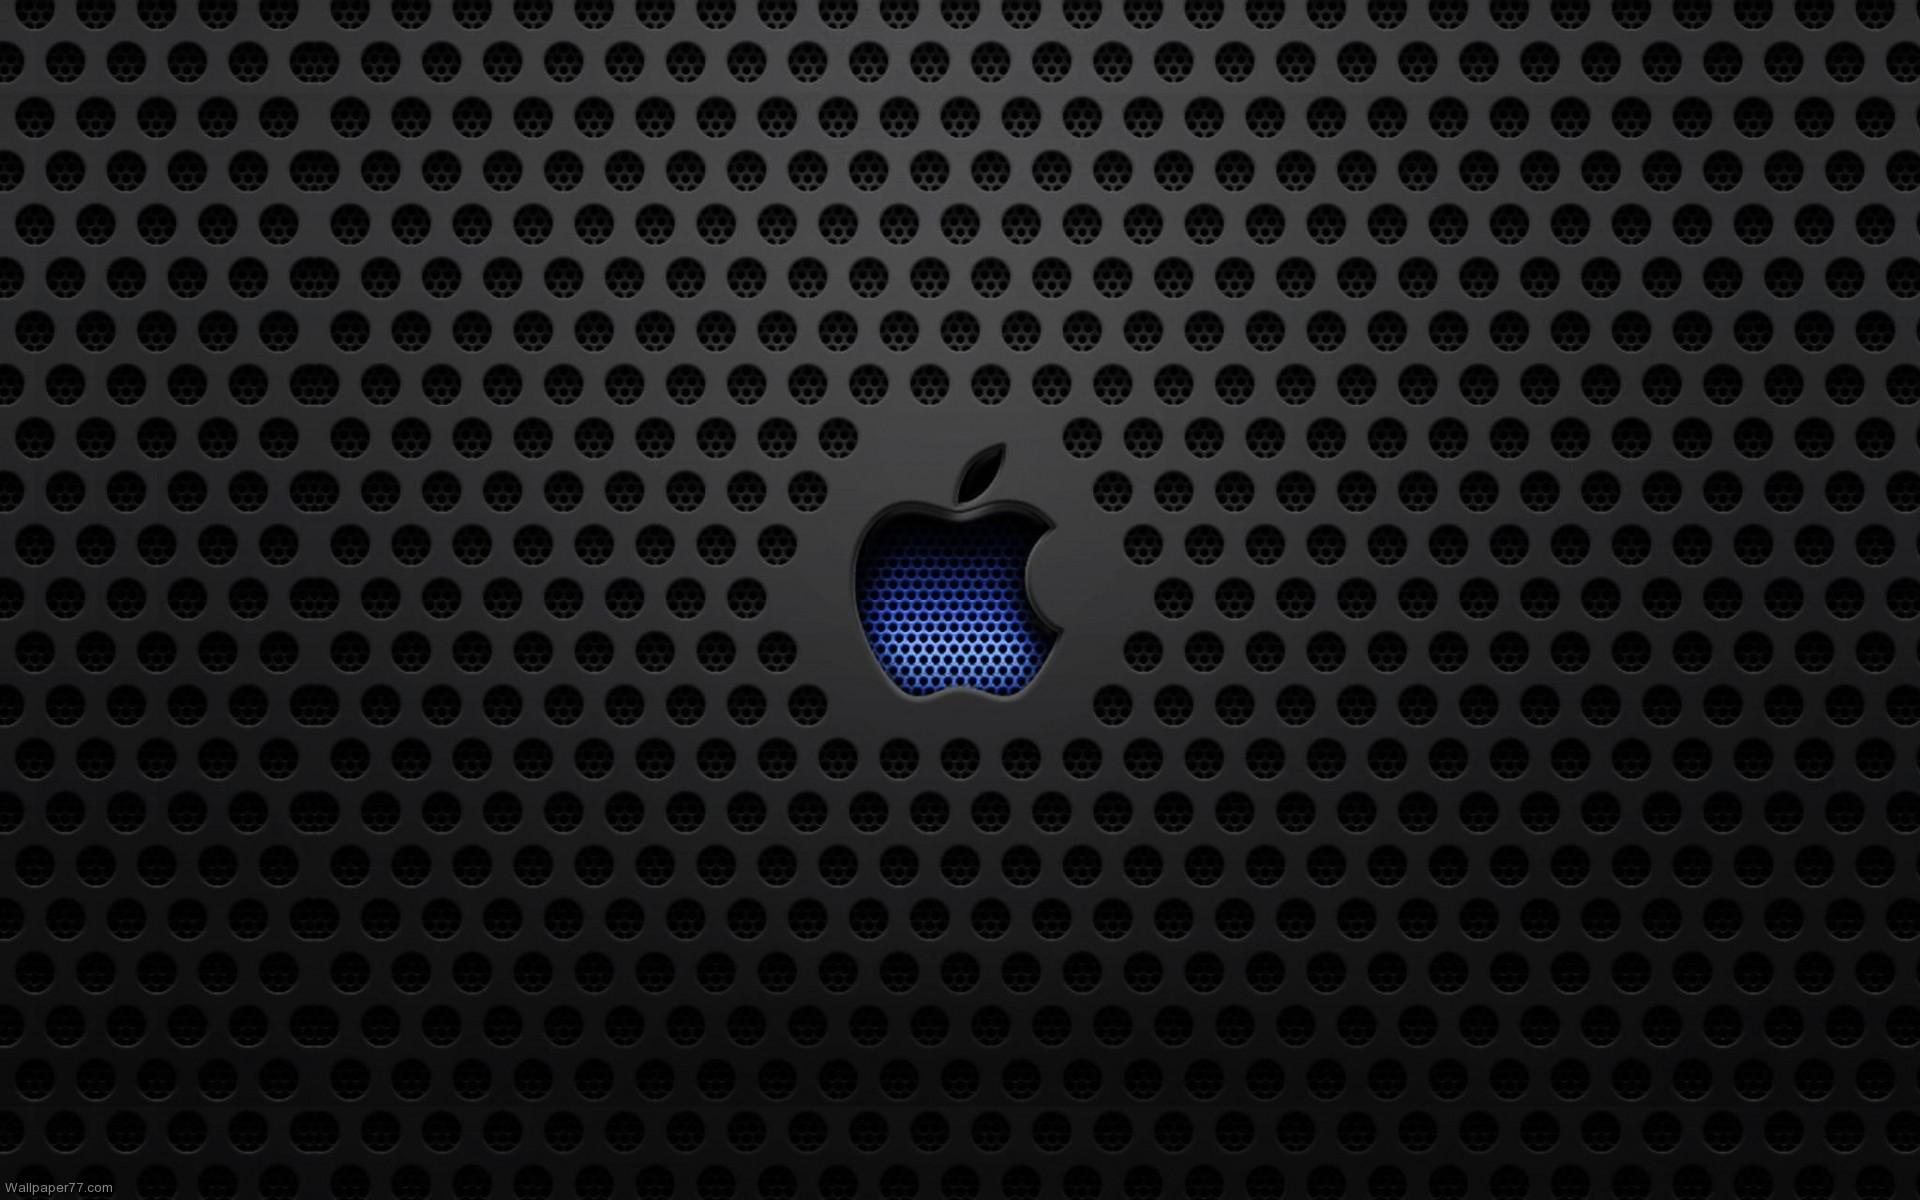 Apple-Logo-ipad-3-wallpaper-ipad-wallpaper-retina-display-wallpaper ...